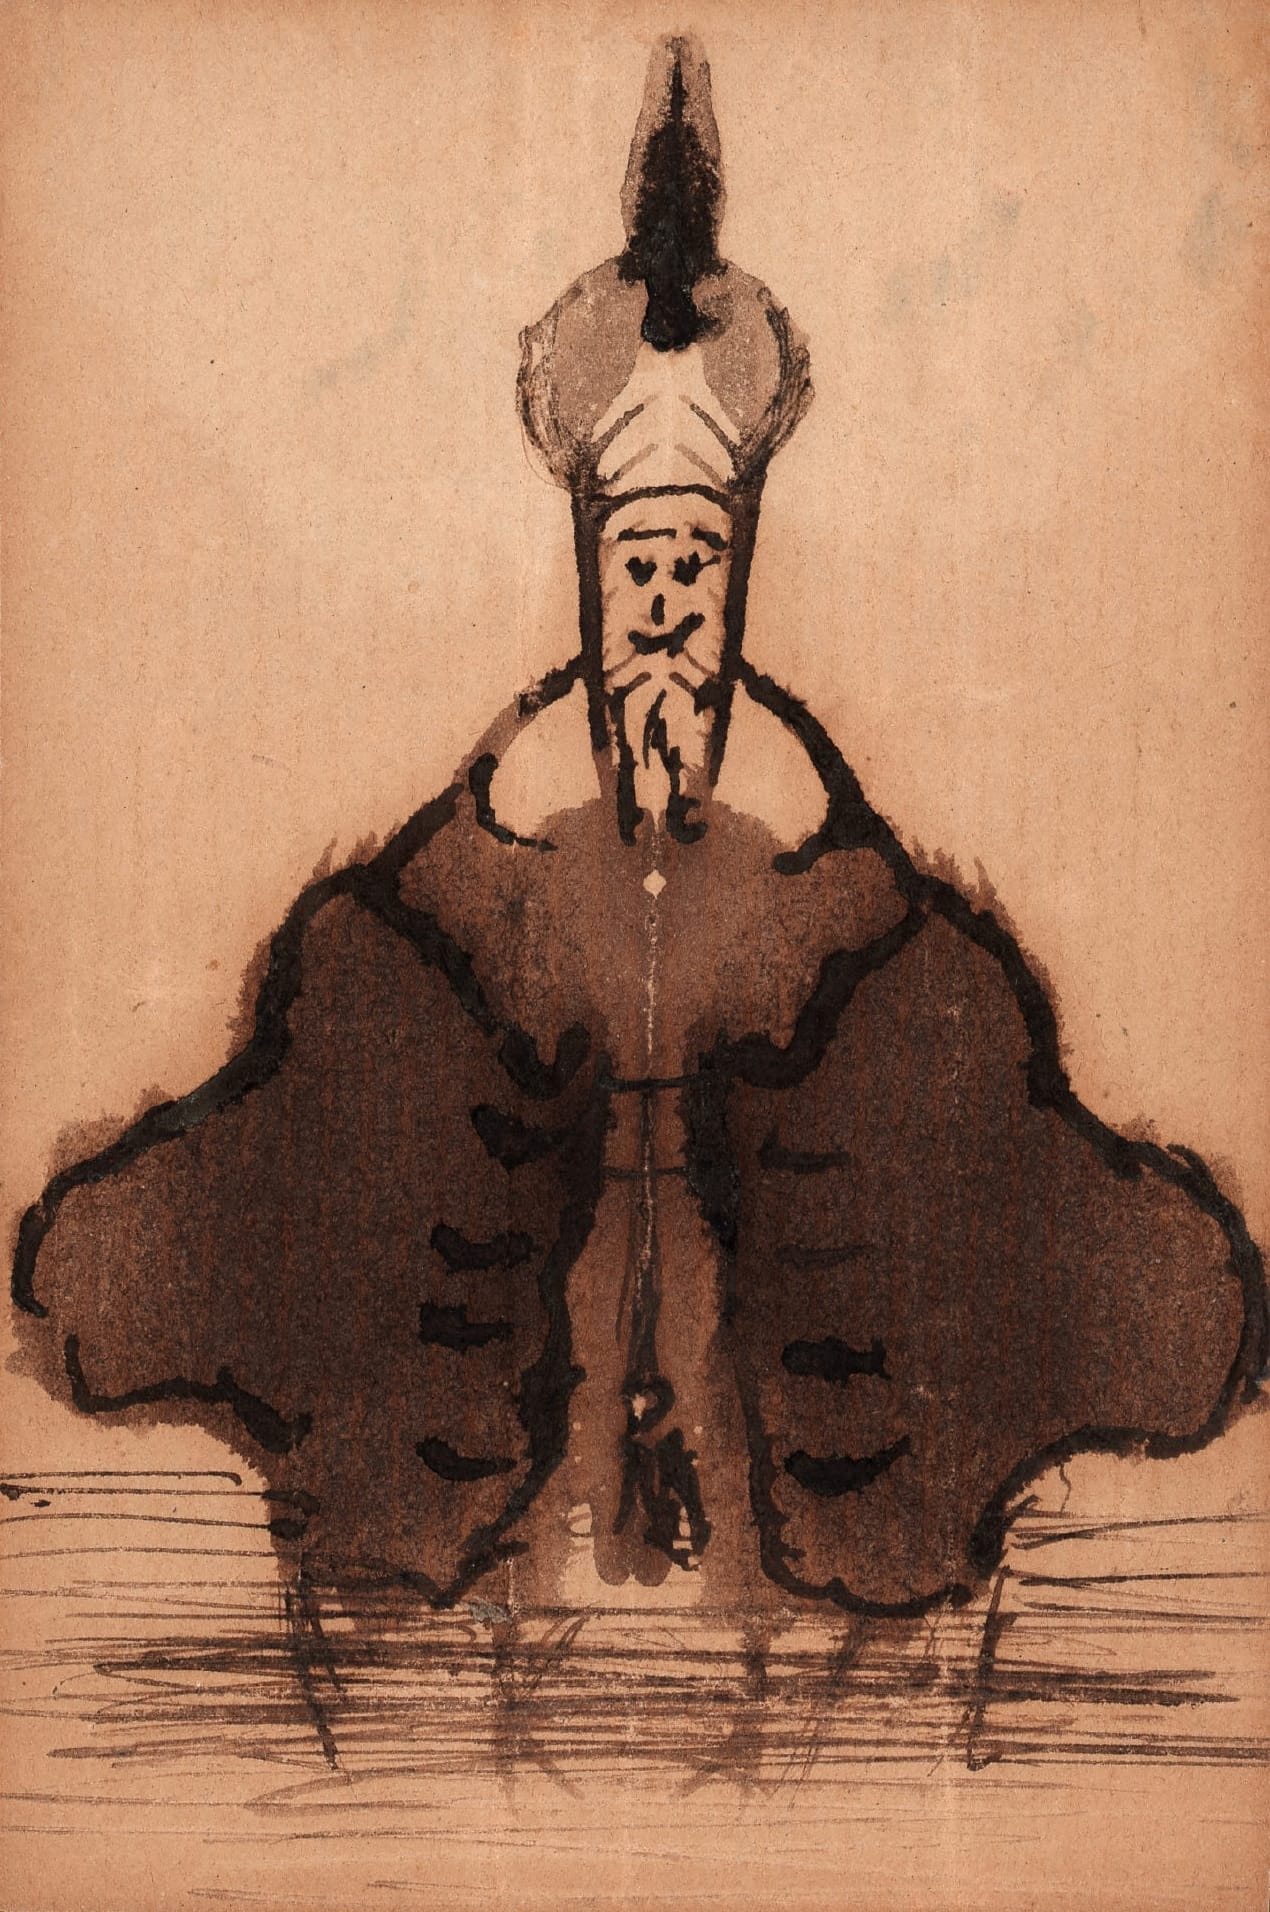 Hans Christian Andersen Mann mit Turban, 1871 Klecksographie Odense City Museums